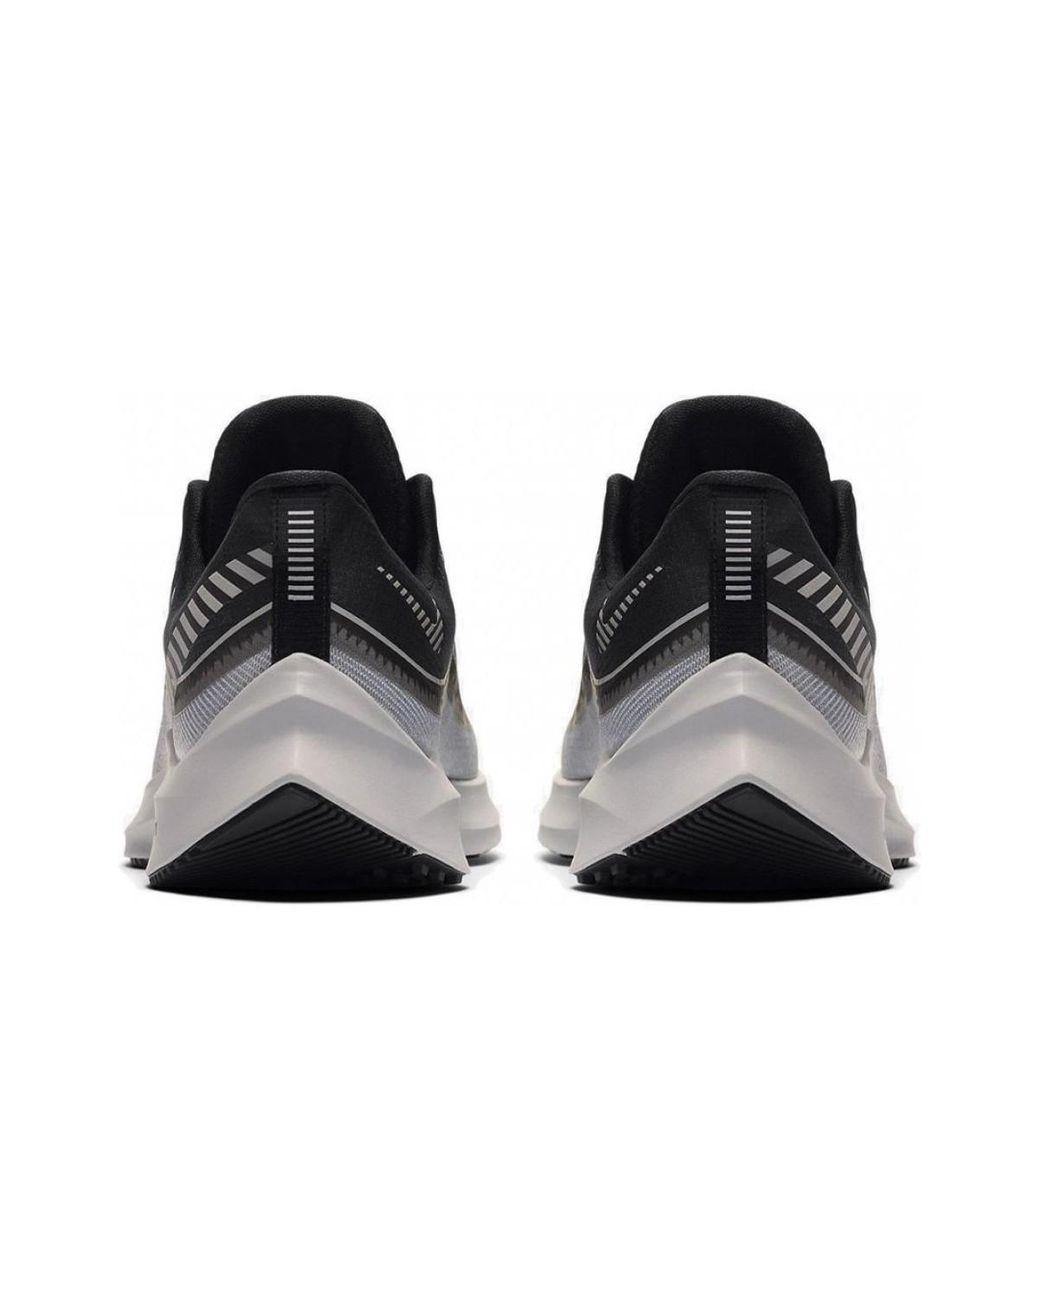 BQ3191 001 WMNS ZOOM WINFLO 6 SHIELD Chaussures Nike en coloris ...